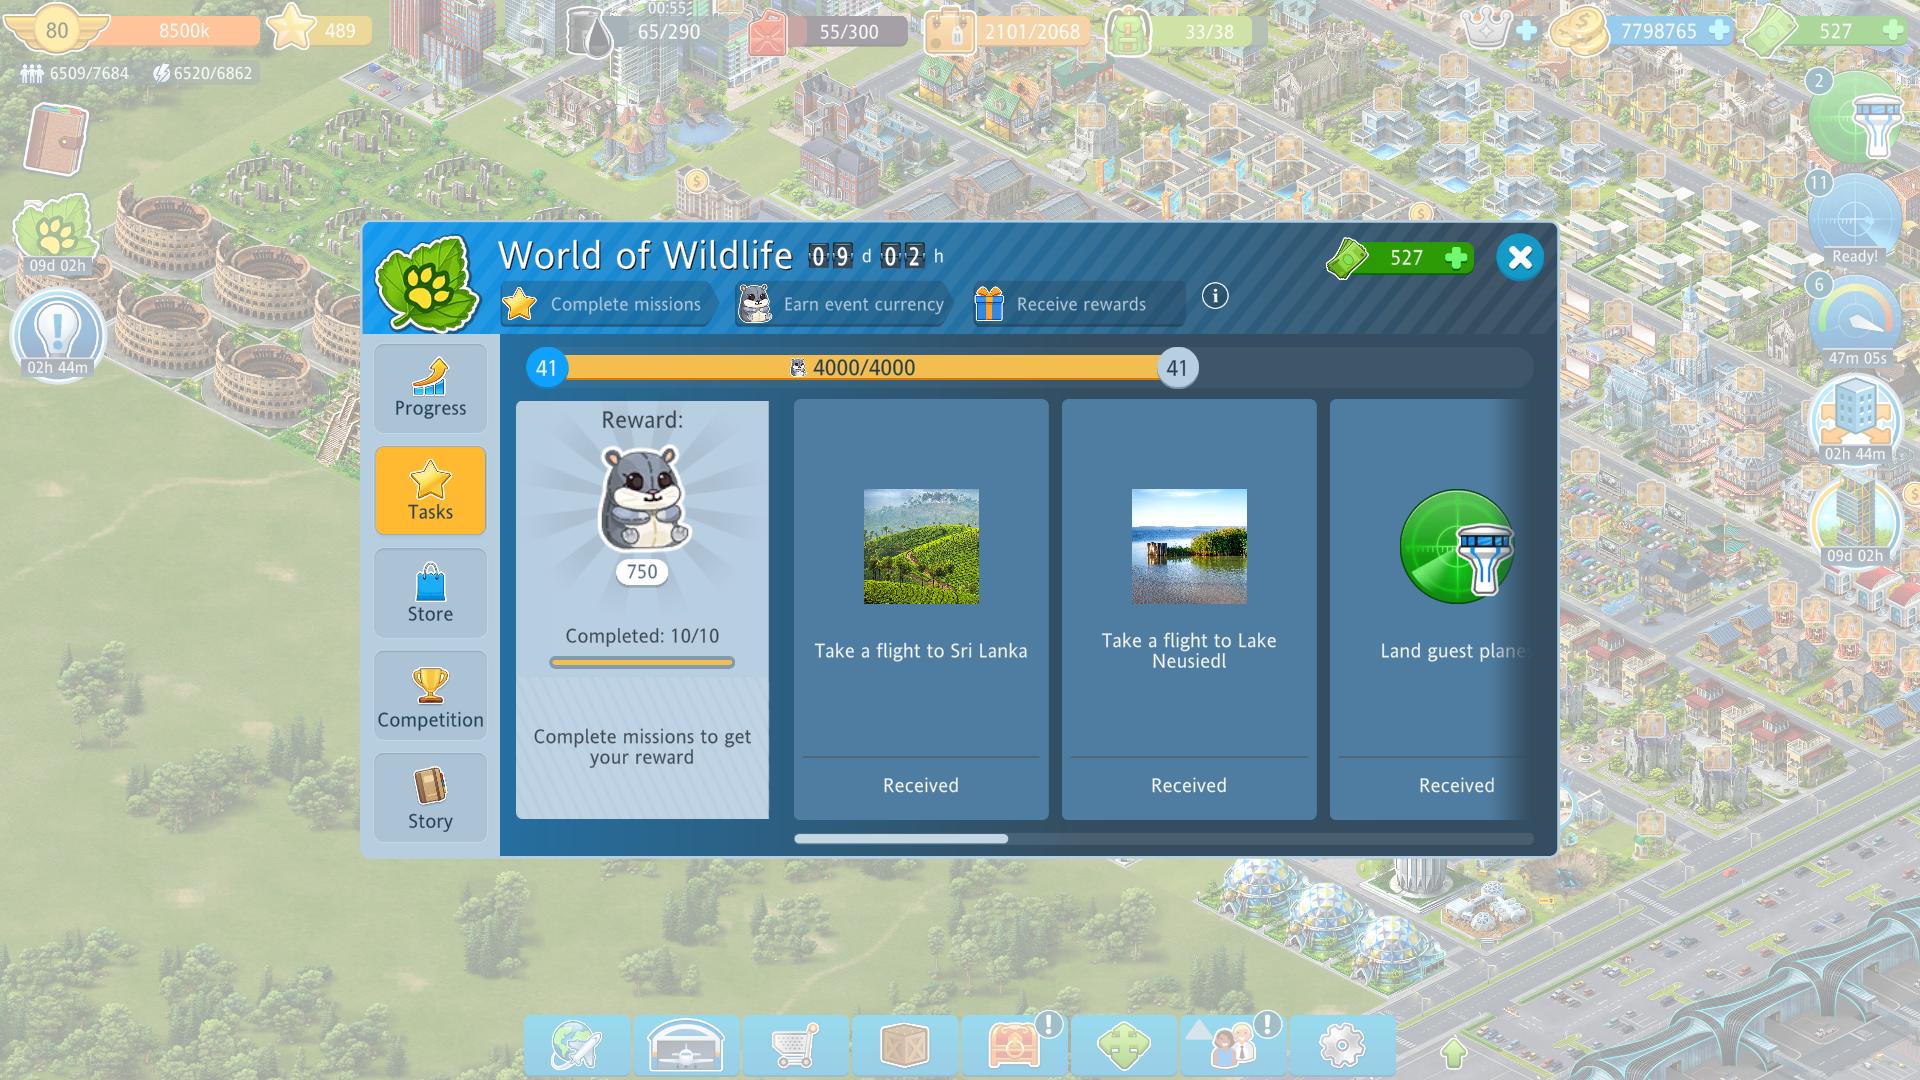 WorldOfWildlife_20ghozgdl_success_tasks.png